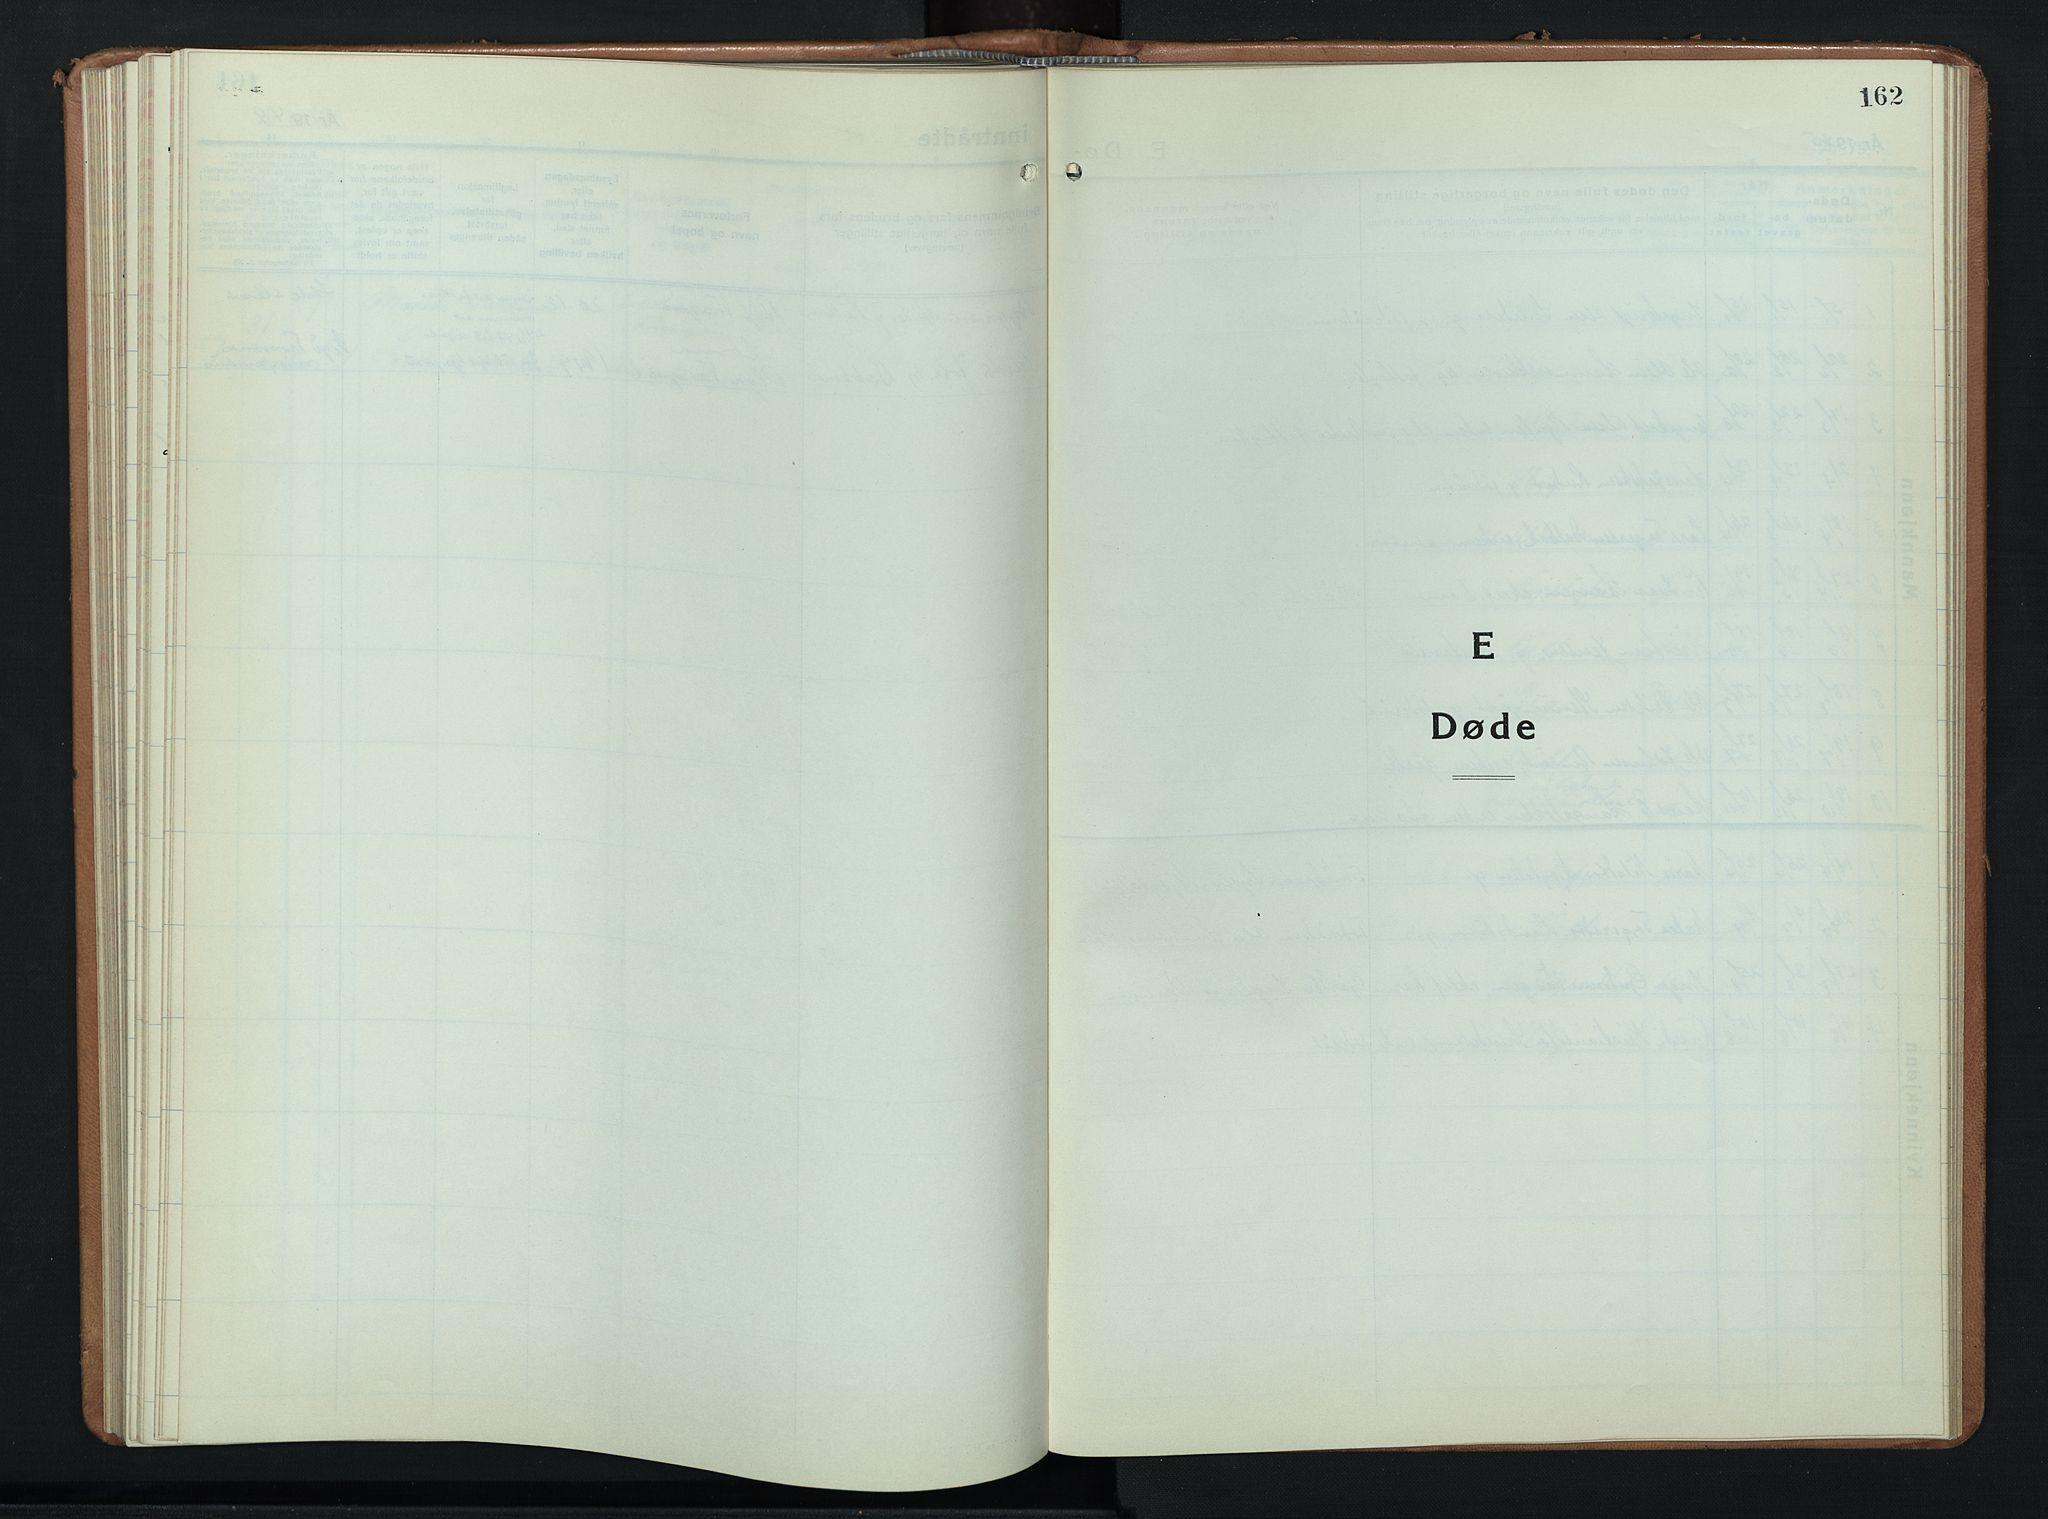 SAH, Ringebu prestekontor, Klokkerbok nr. 12, 1934-1949, s. 162